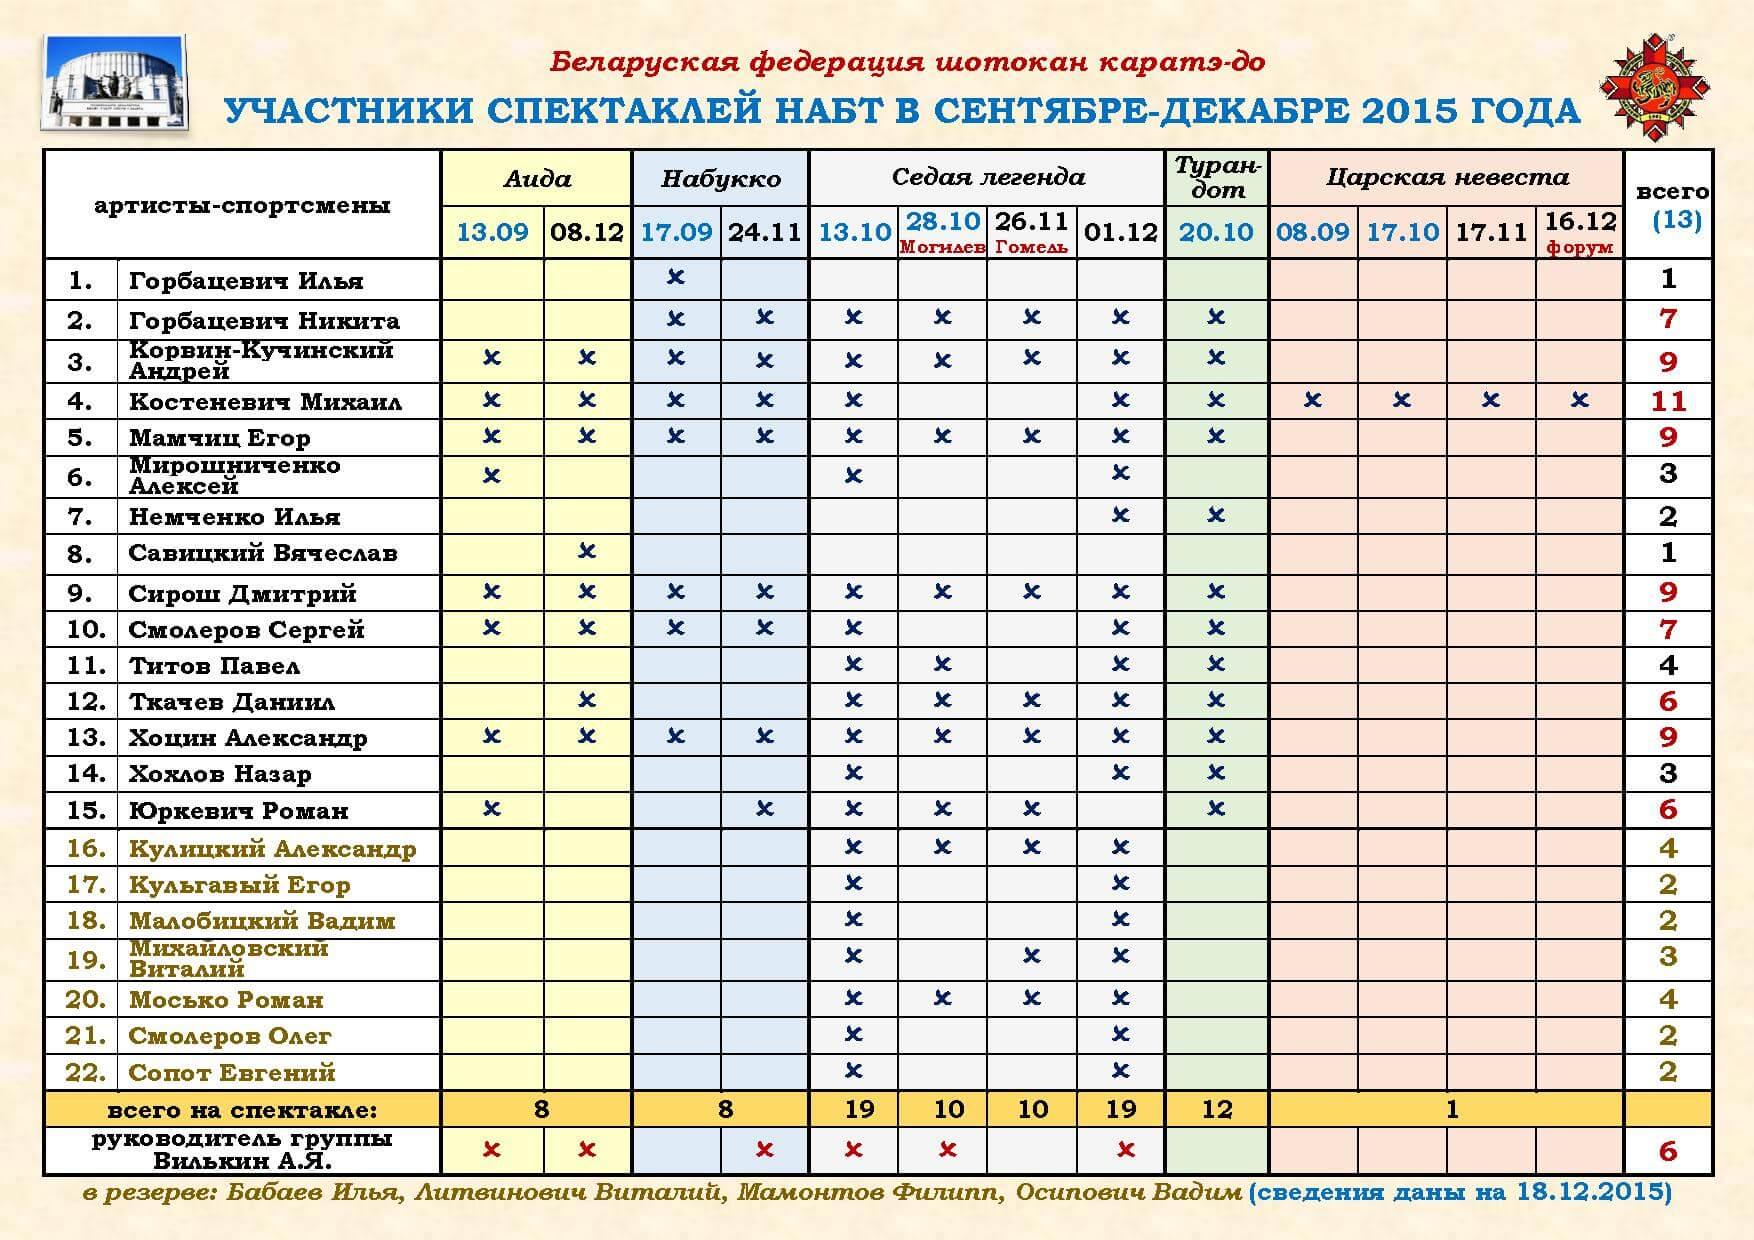 НАБТ 2015 09-12 Участники БФШК